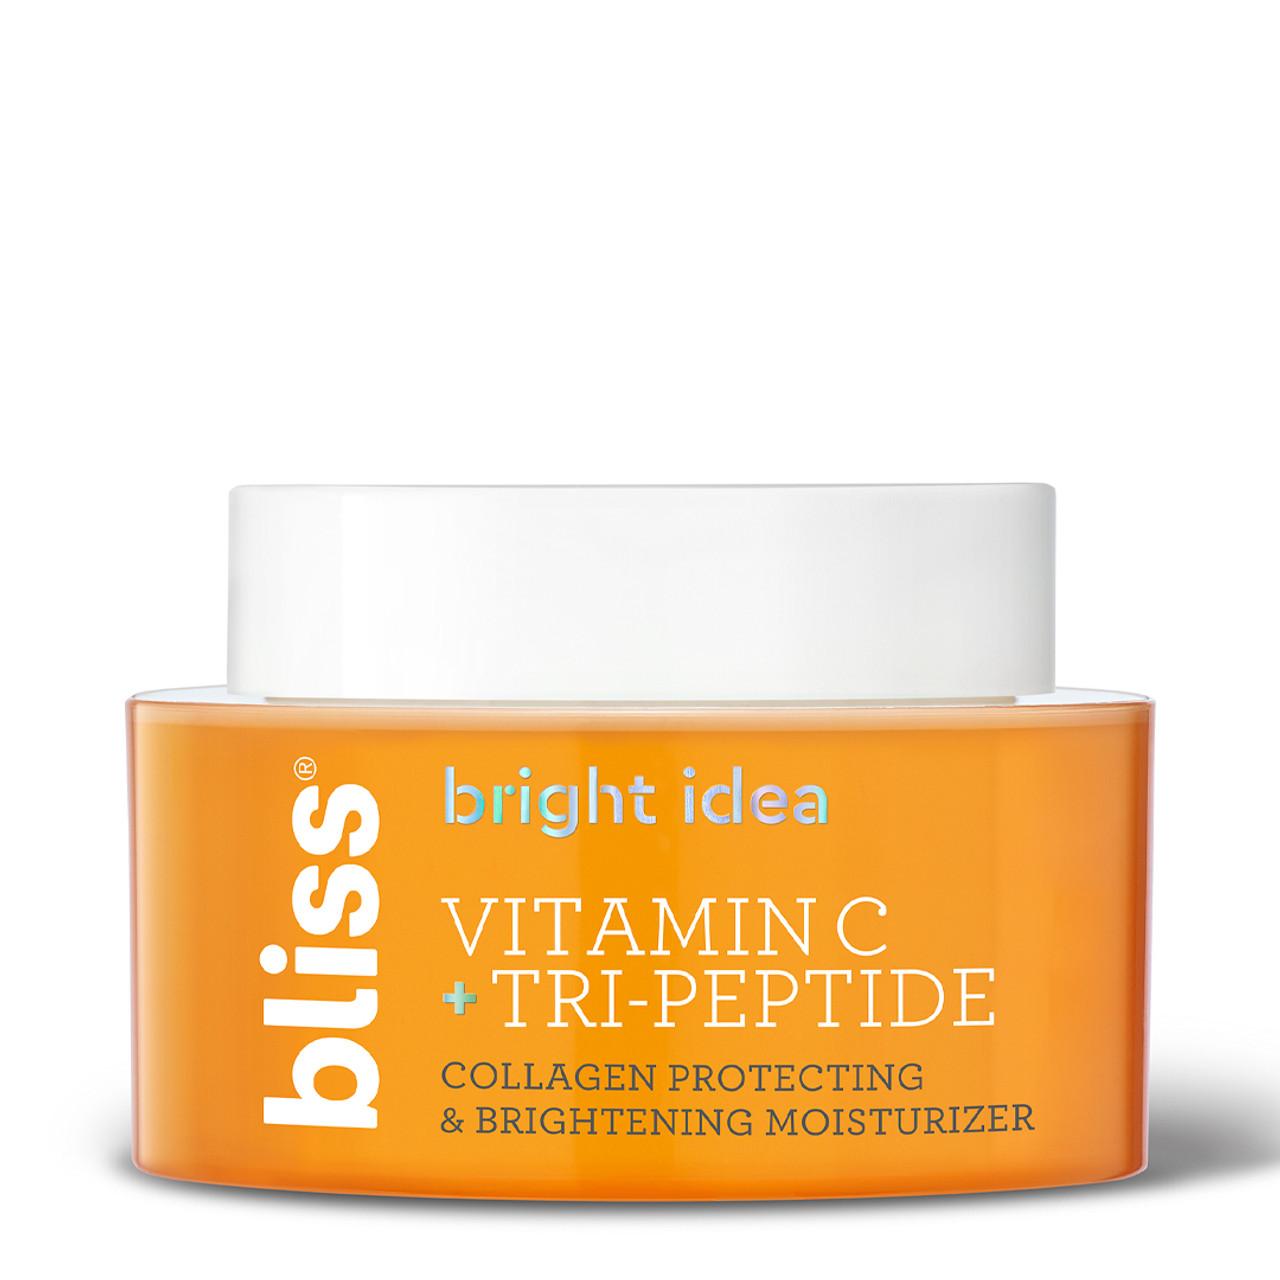 Bright Idea Moisturizer